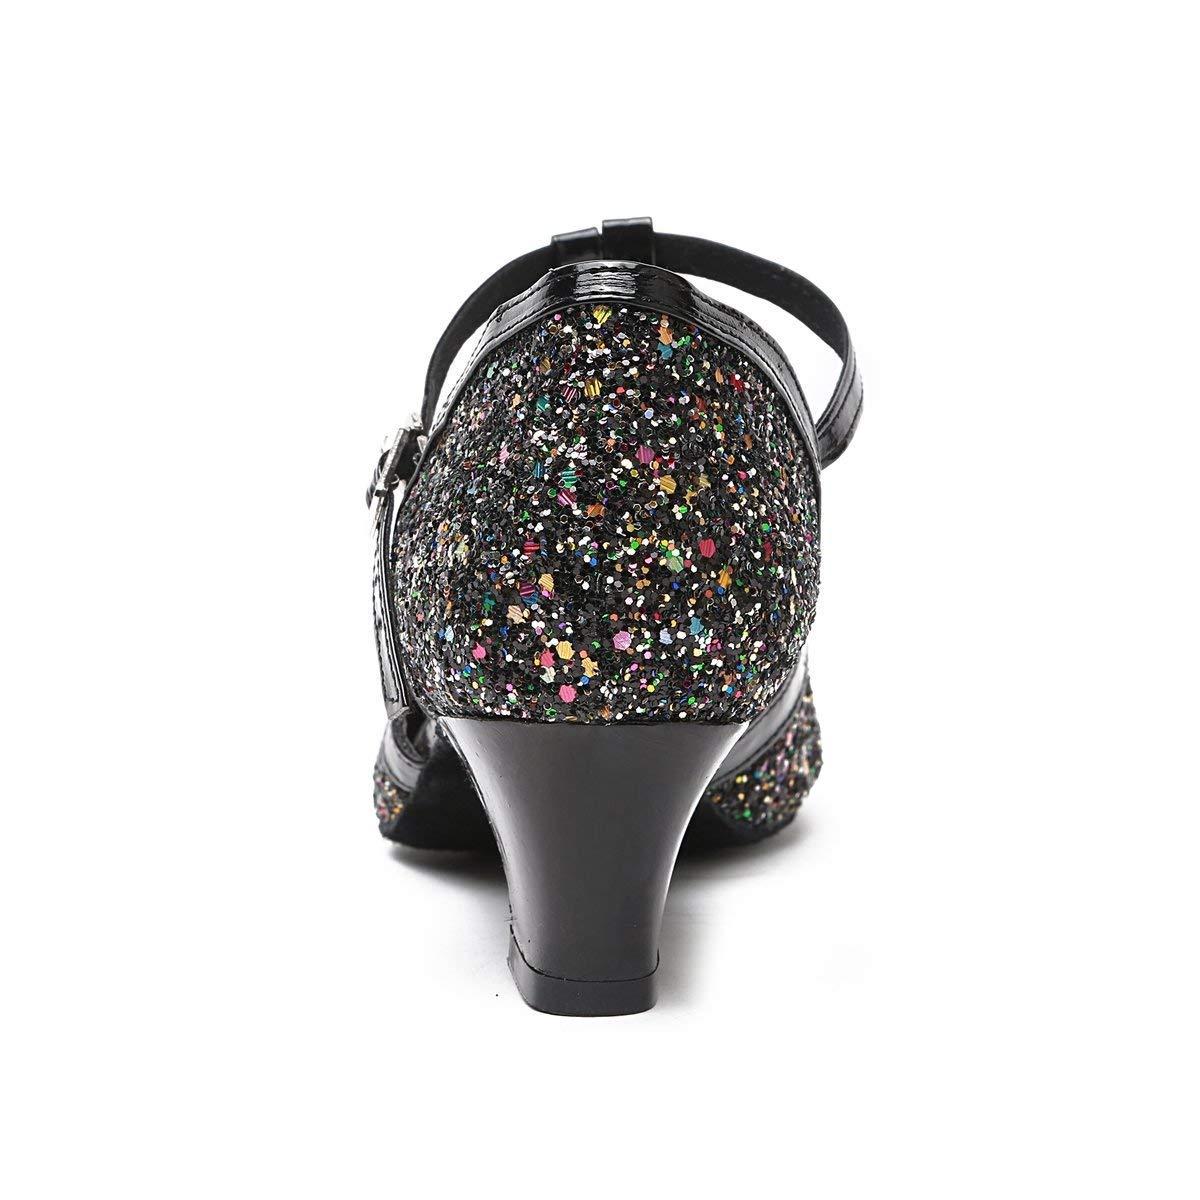 Qiusa Frauen T-Strap Flarot Heel Glitter Glitter Glitter Latin Ballroom Tanzschuhe Party Pumps (Farbe   schwarz-5cm Heel Größe   7.5 UK) 1b9c37